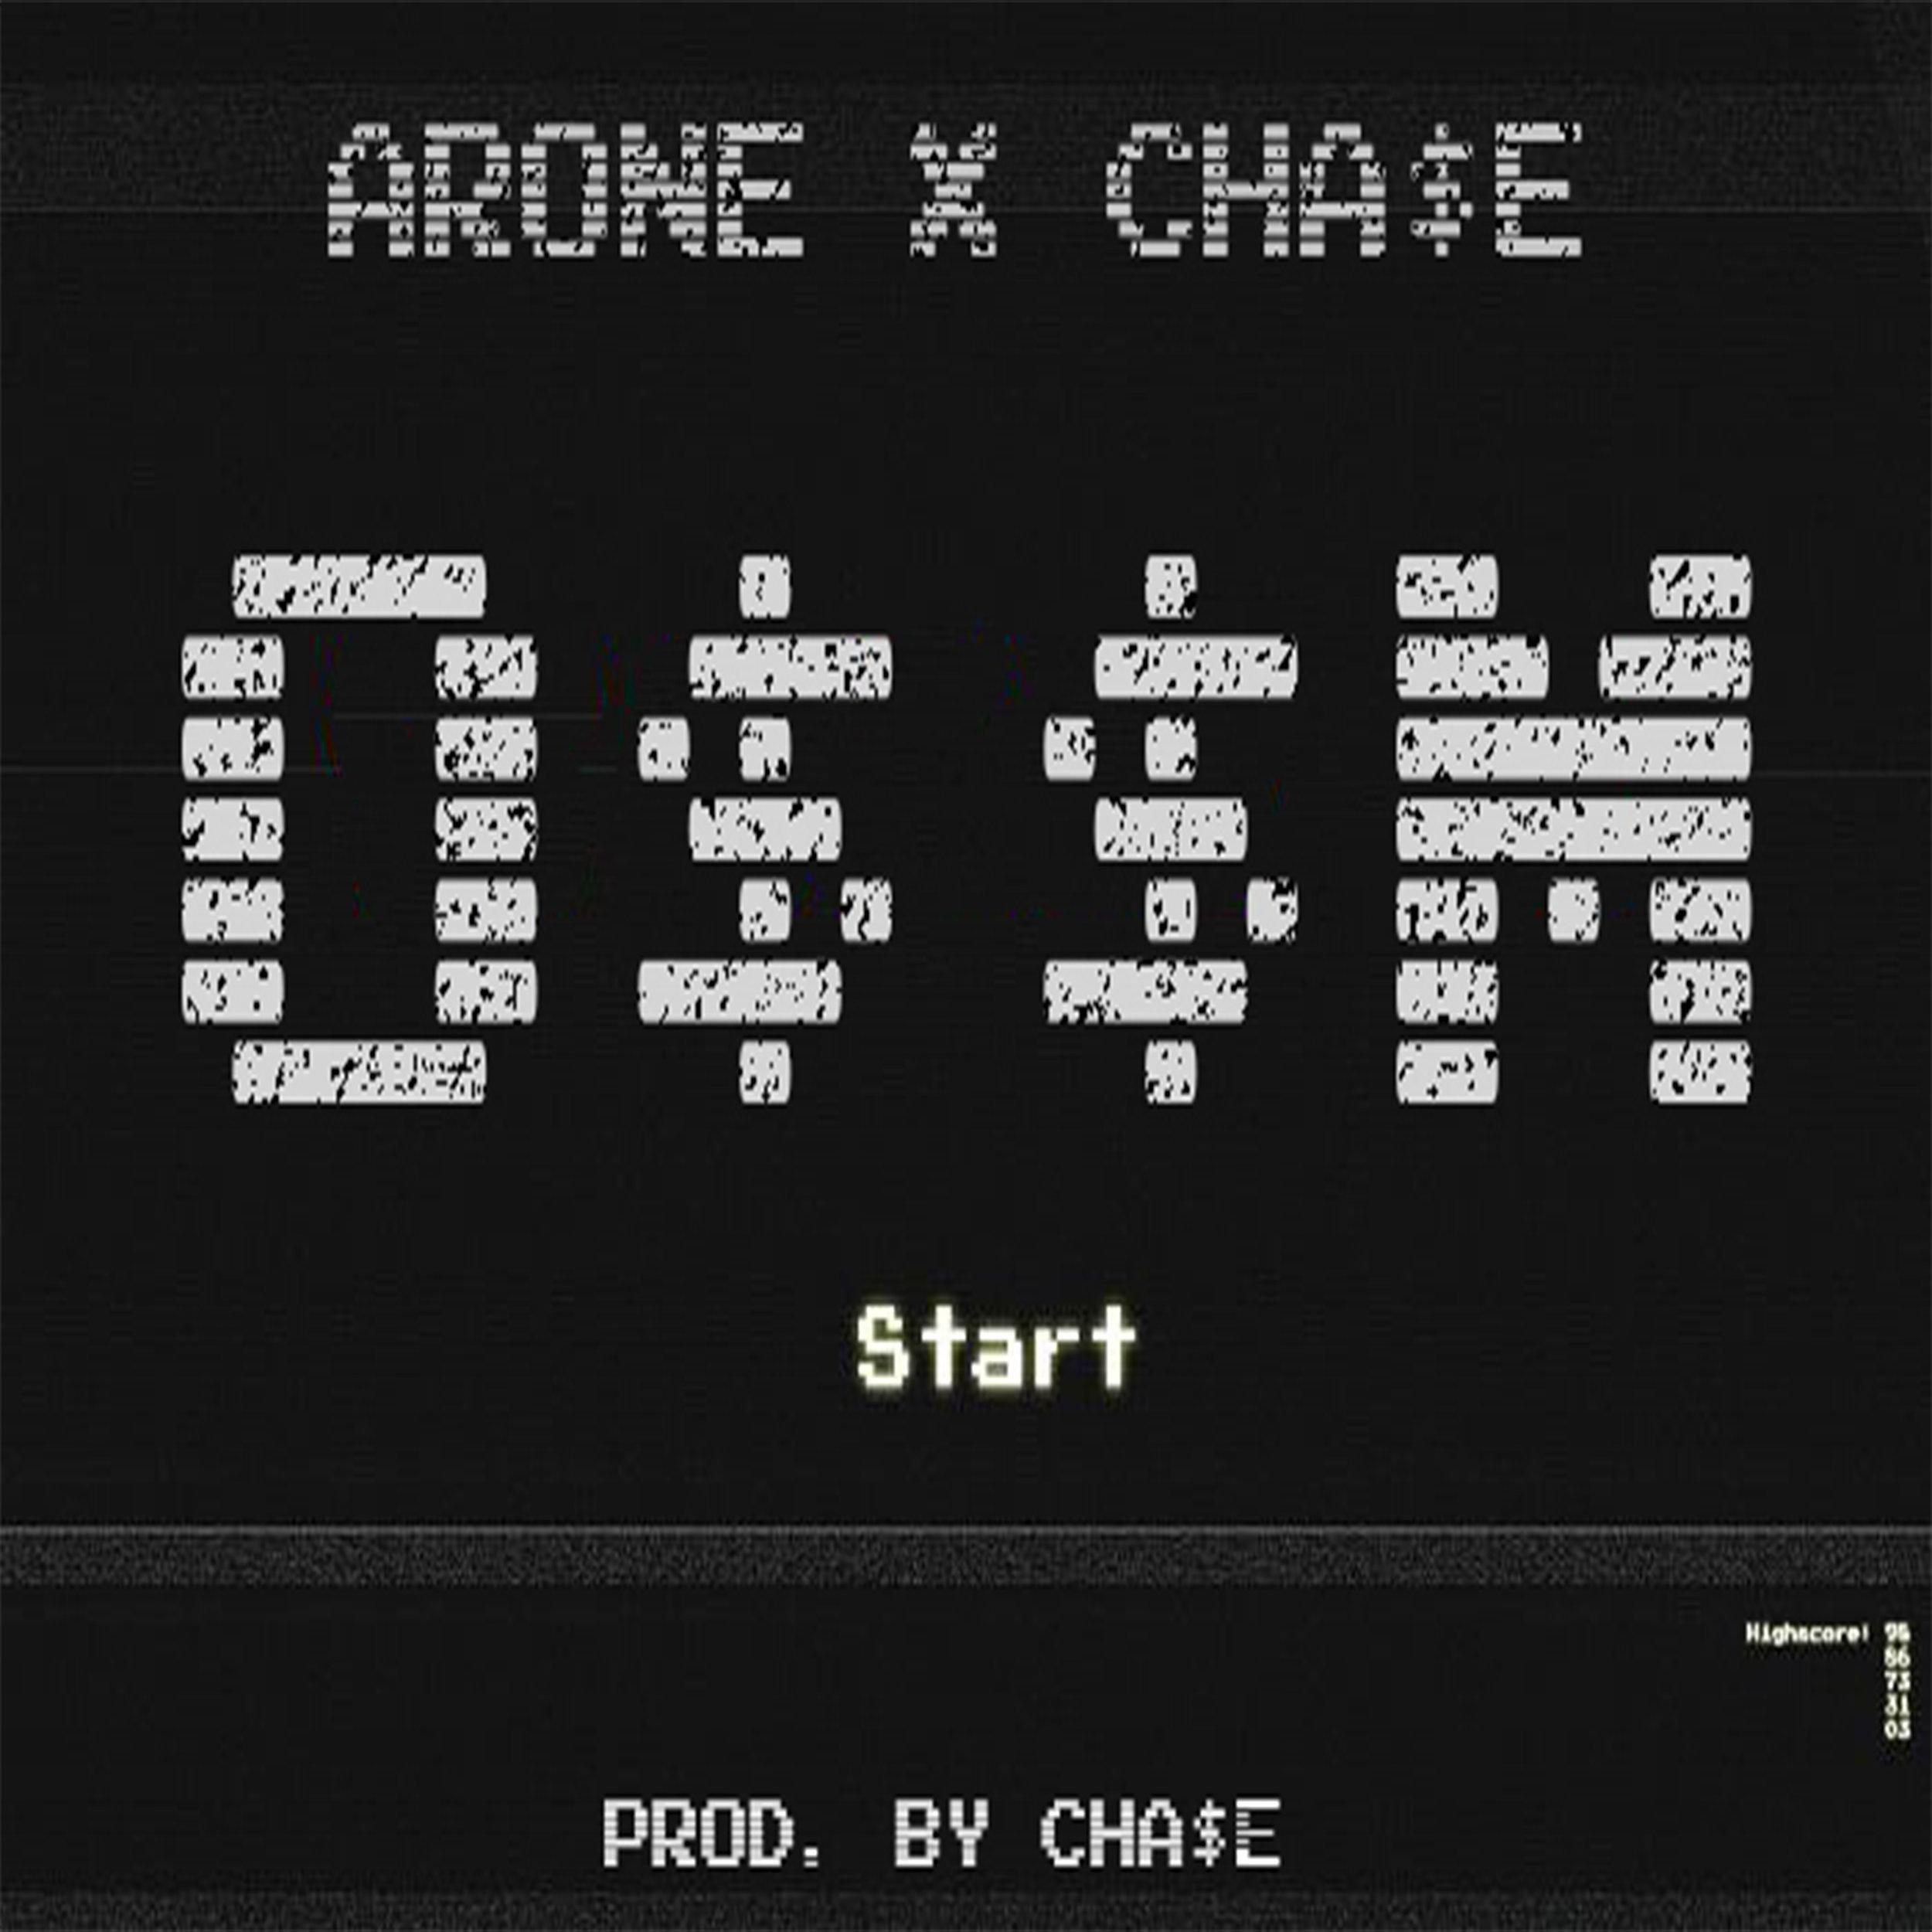 O$$M Mixtape Cover.jpg